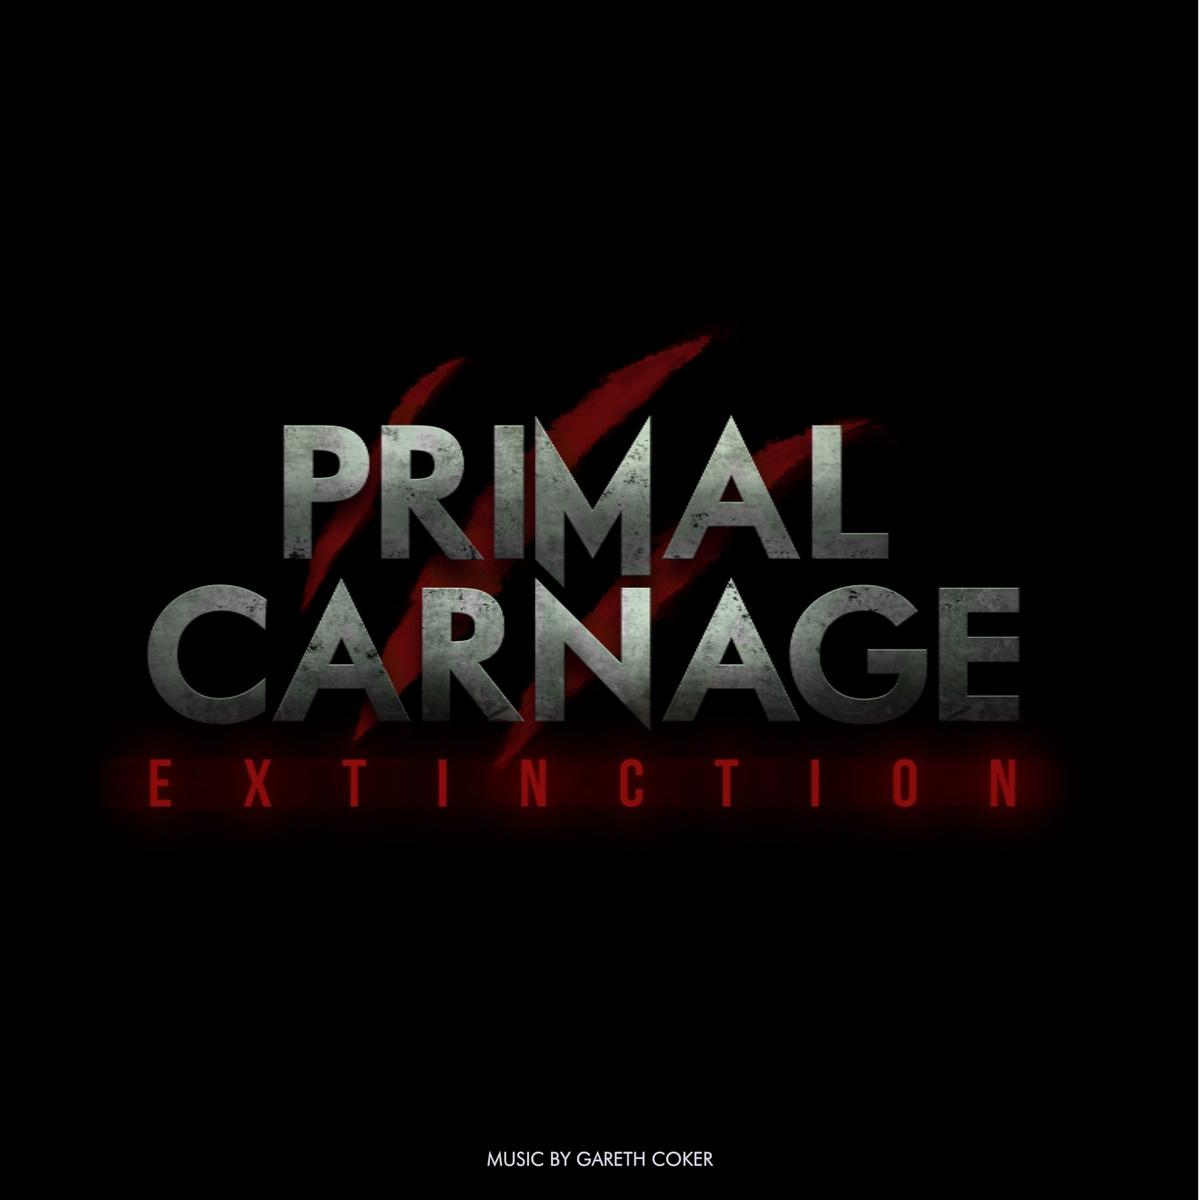 Primal_Carnage-Extinction-Surviving_the_Horde_OST__cover1200x1200.jpg